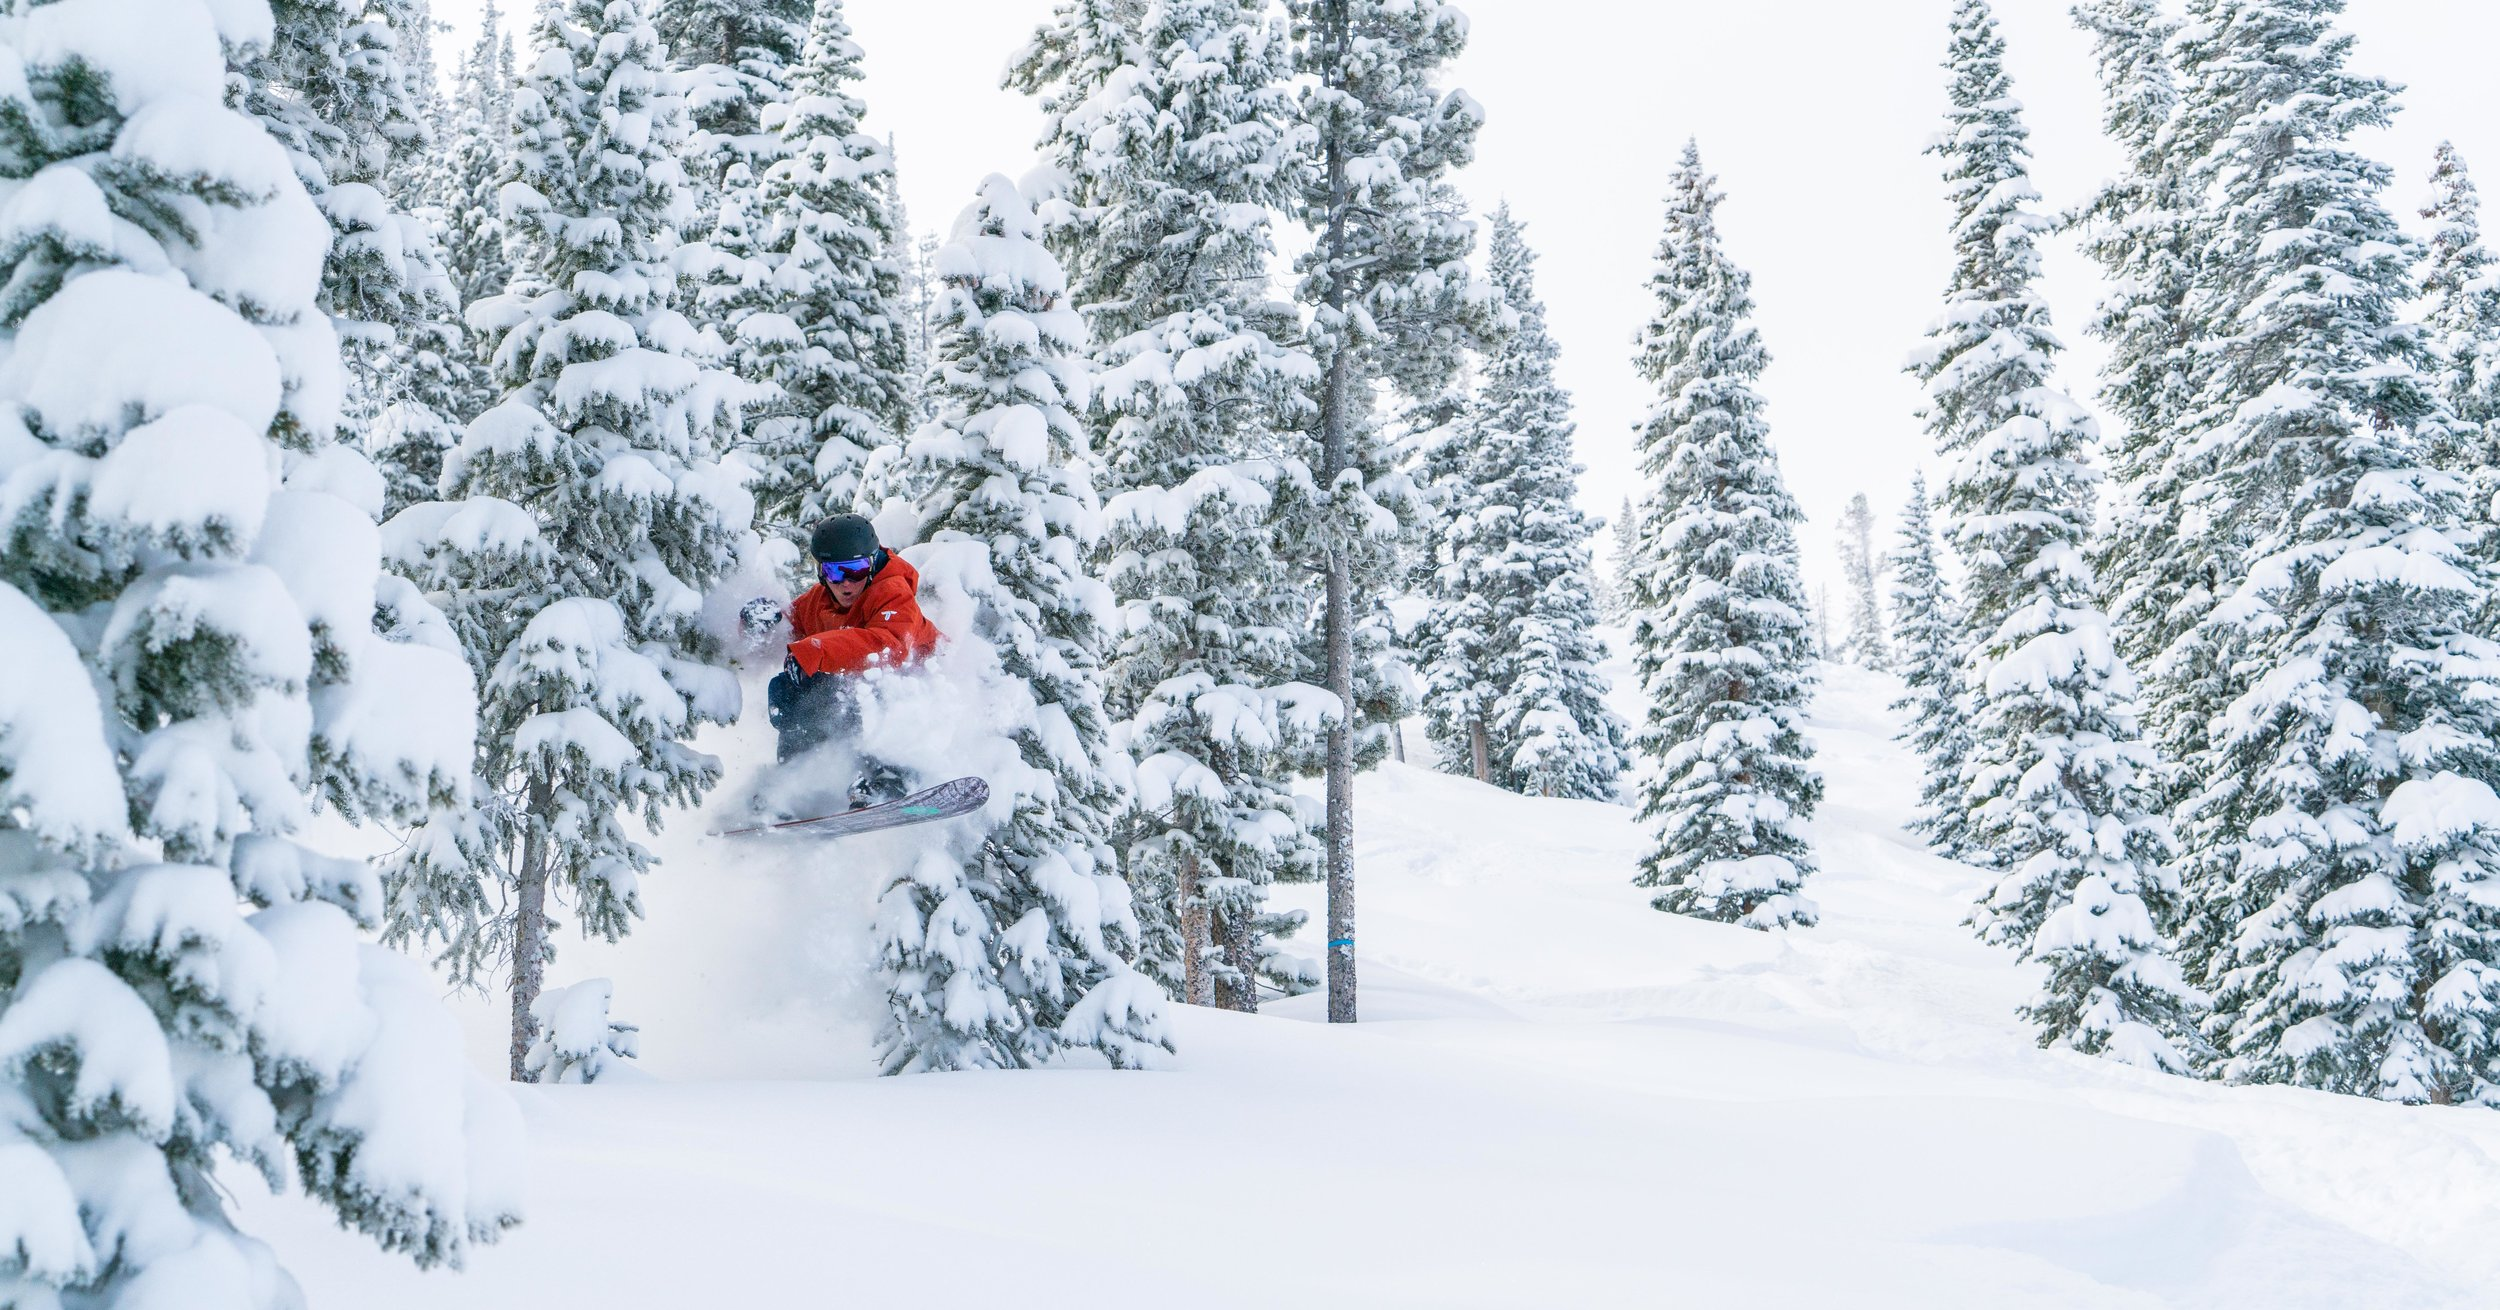 R: Aaron Anderson | P: Carl Frey - Winter Park Resort